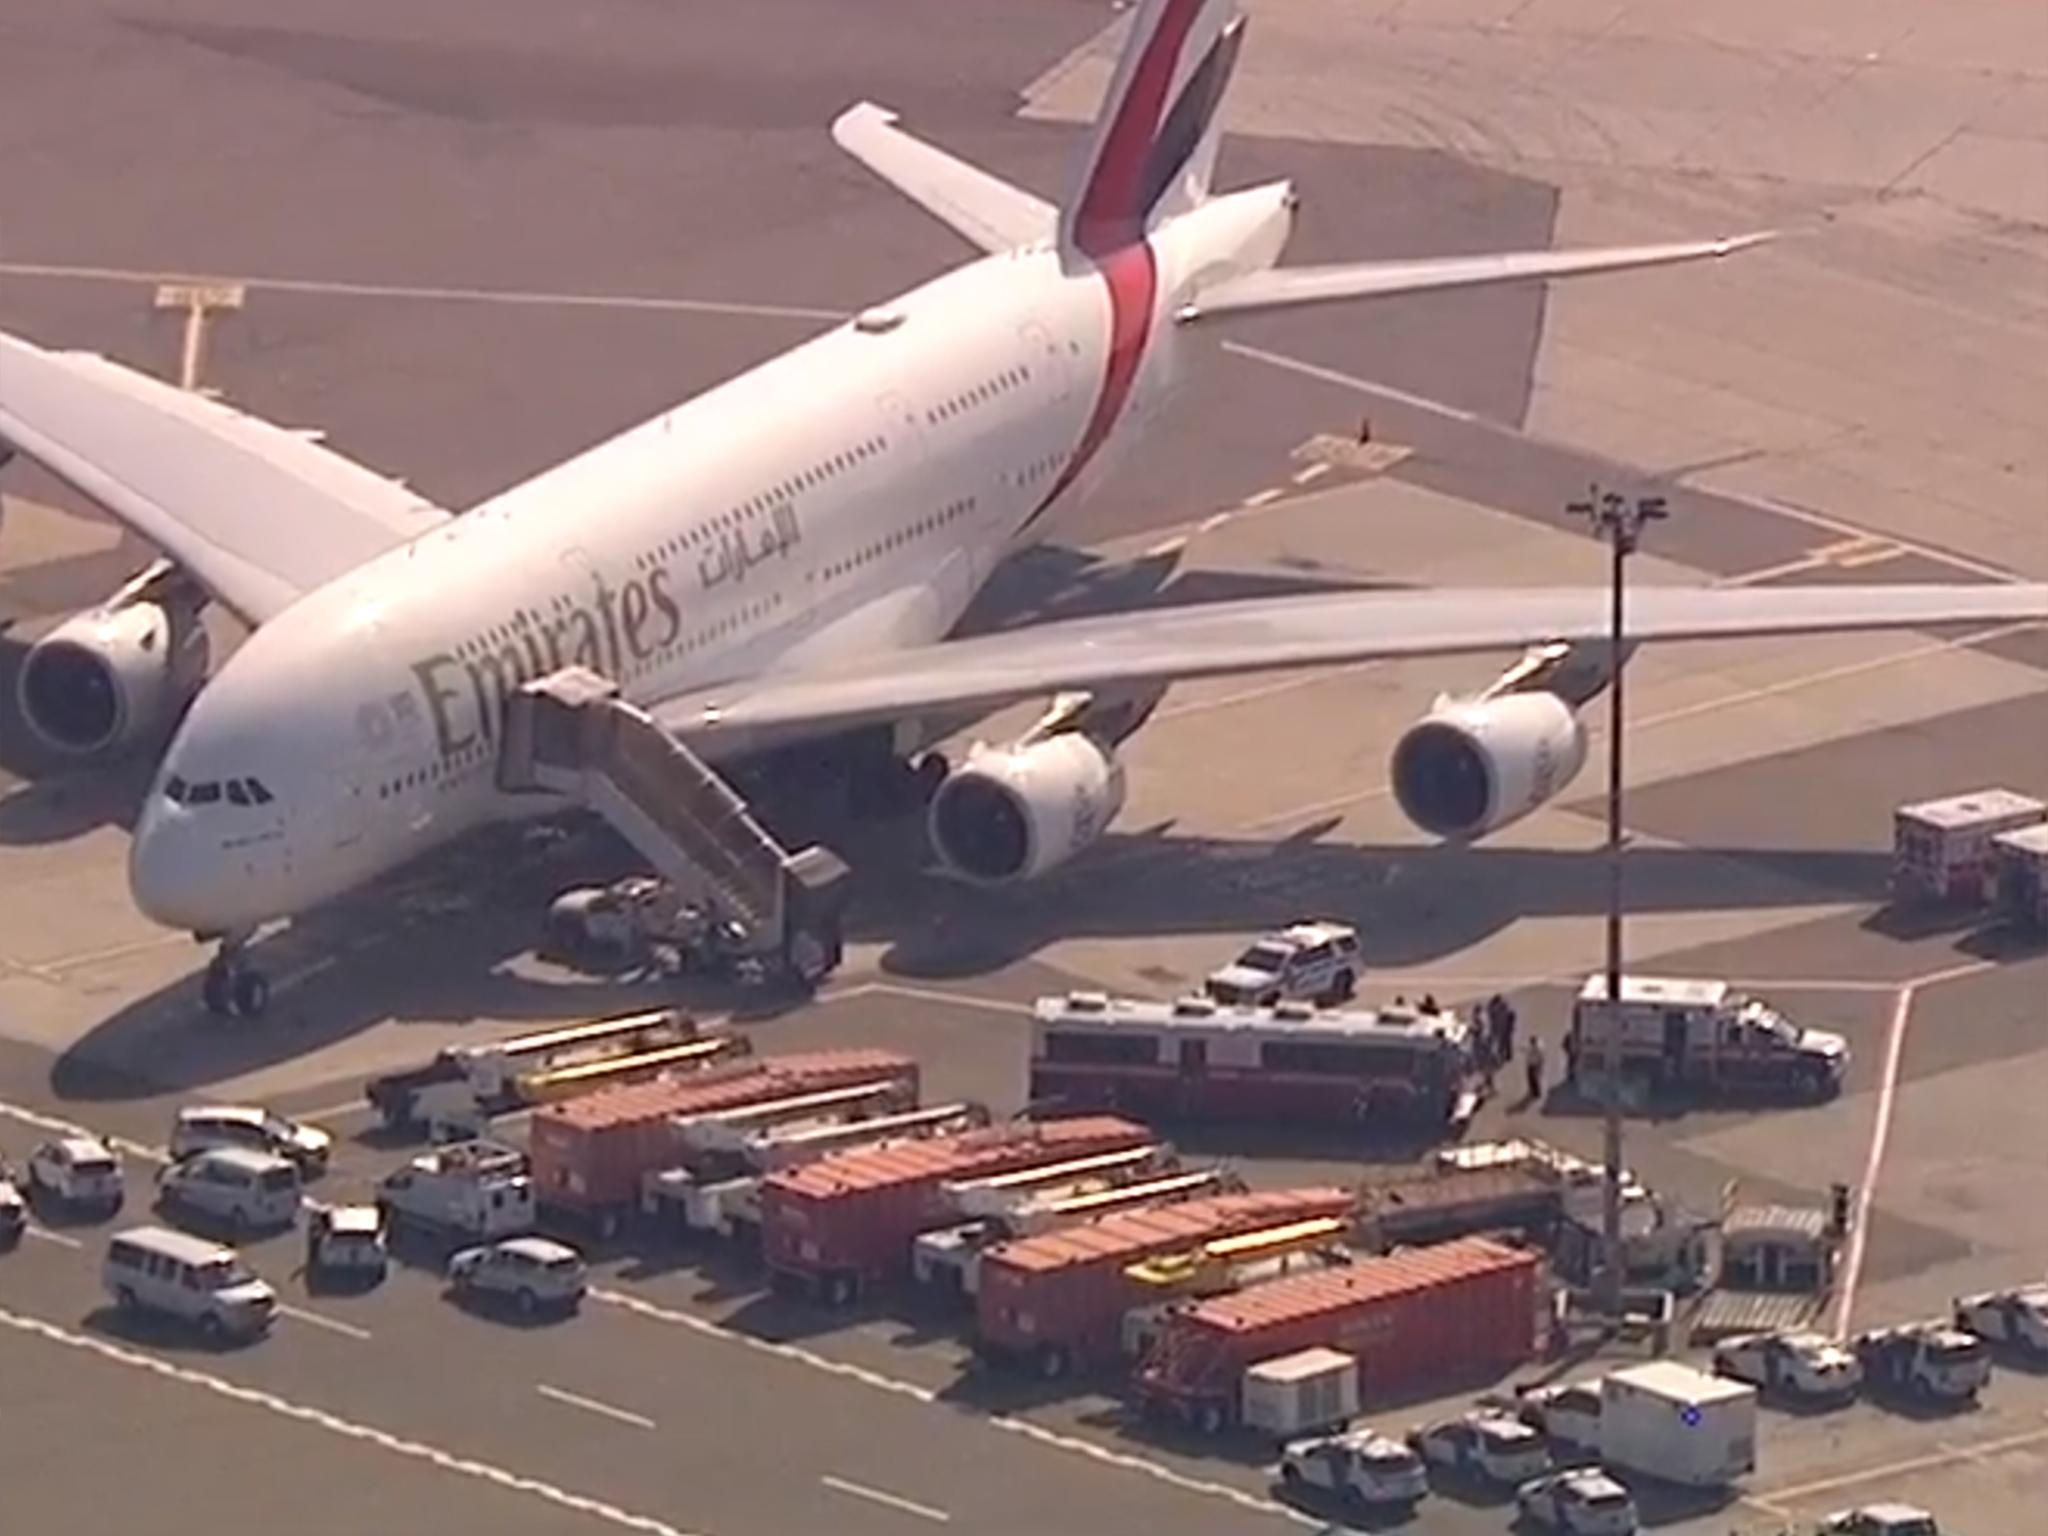 d068d6a917 JFK airport  Passengers on quarantined Emirates flight from Dubai had flu